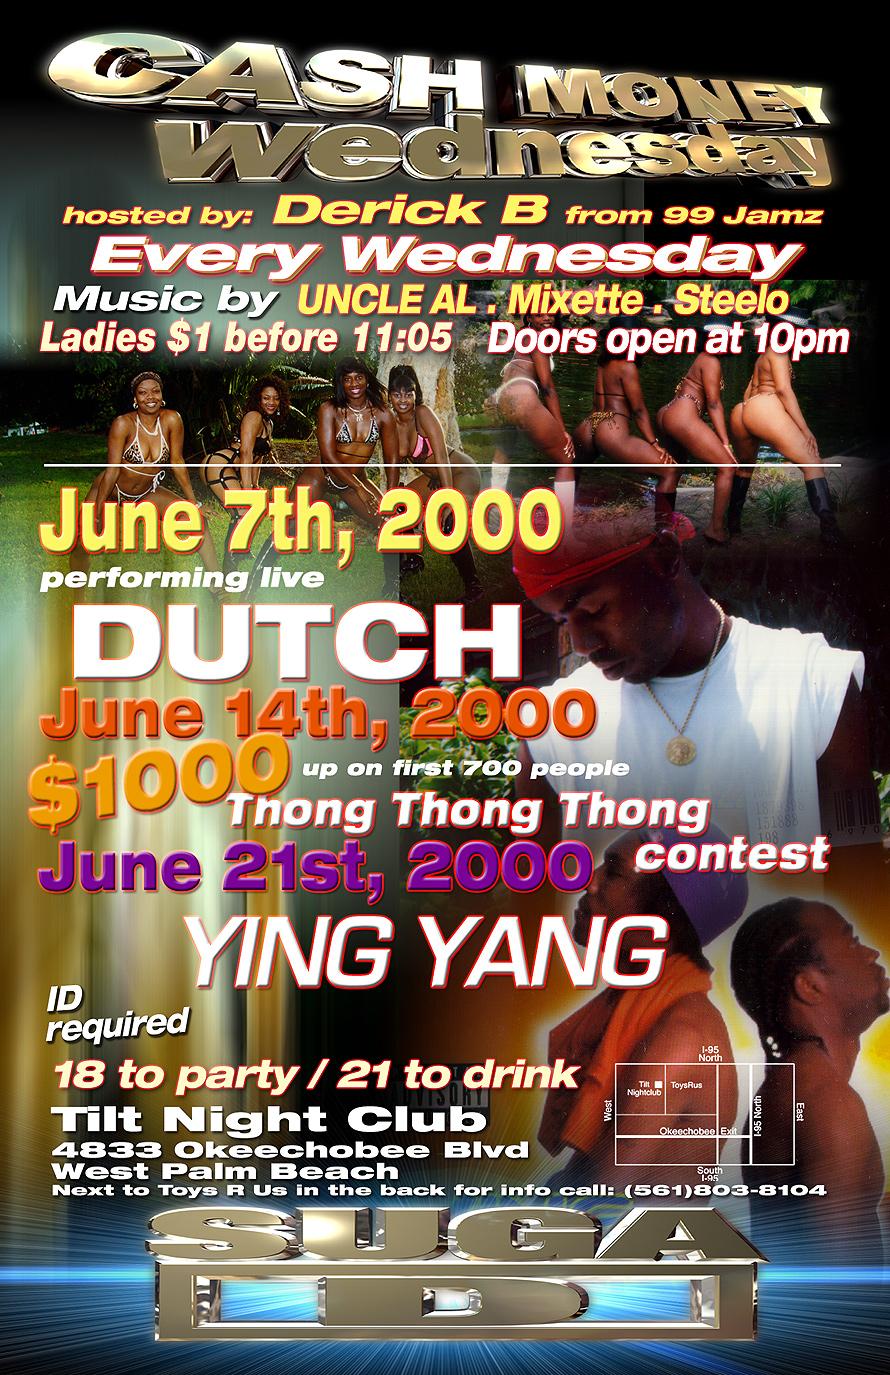 Cash Money Wednesday at Tilt Nightclub